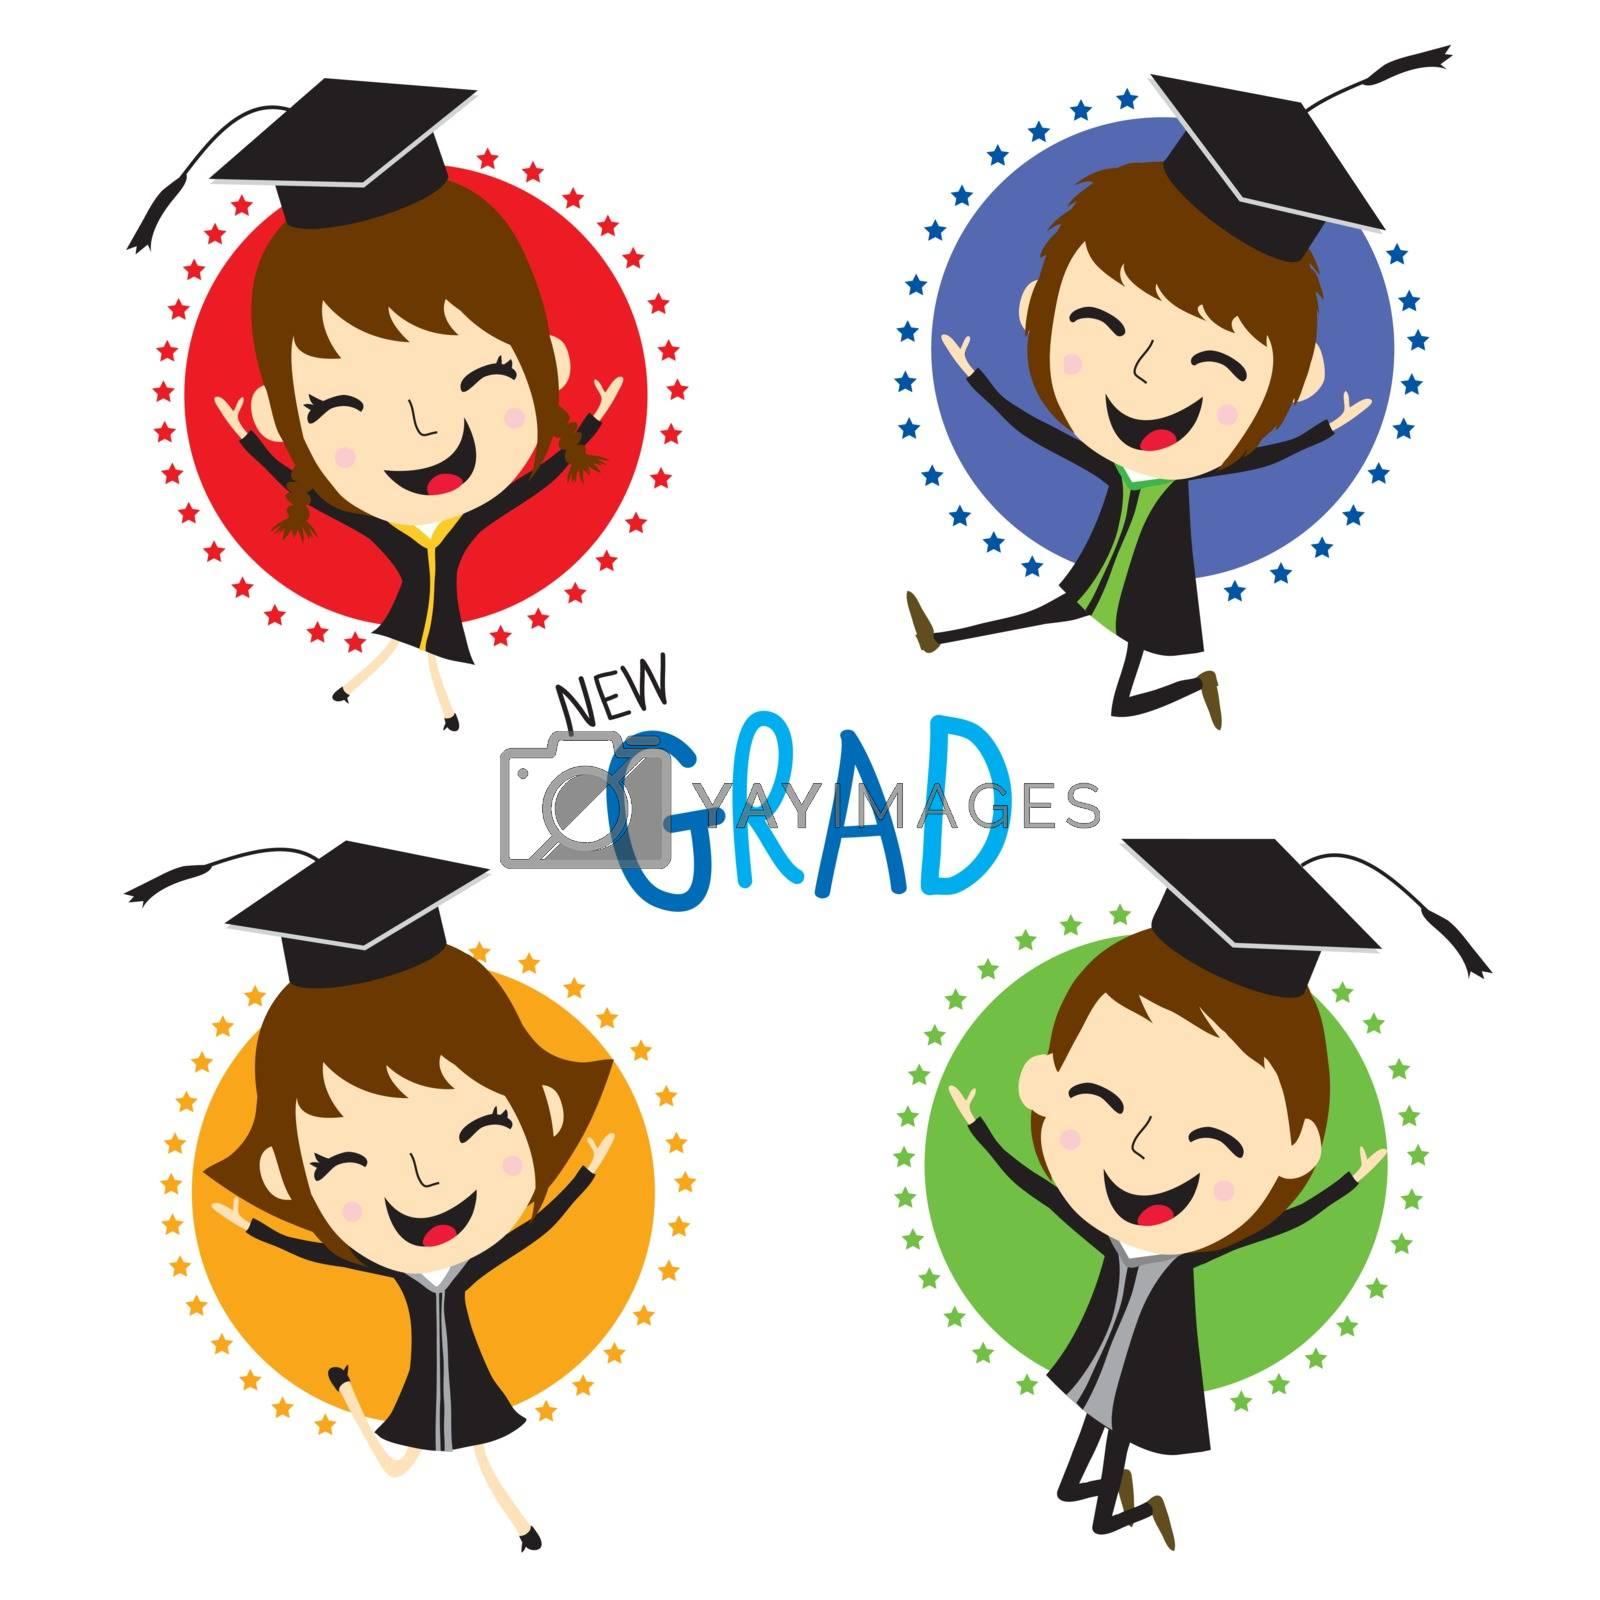 Congratulation with New graduate kid in Graduation Day cartoon Vector